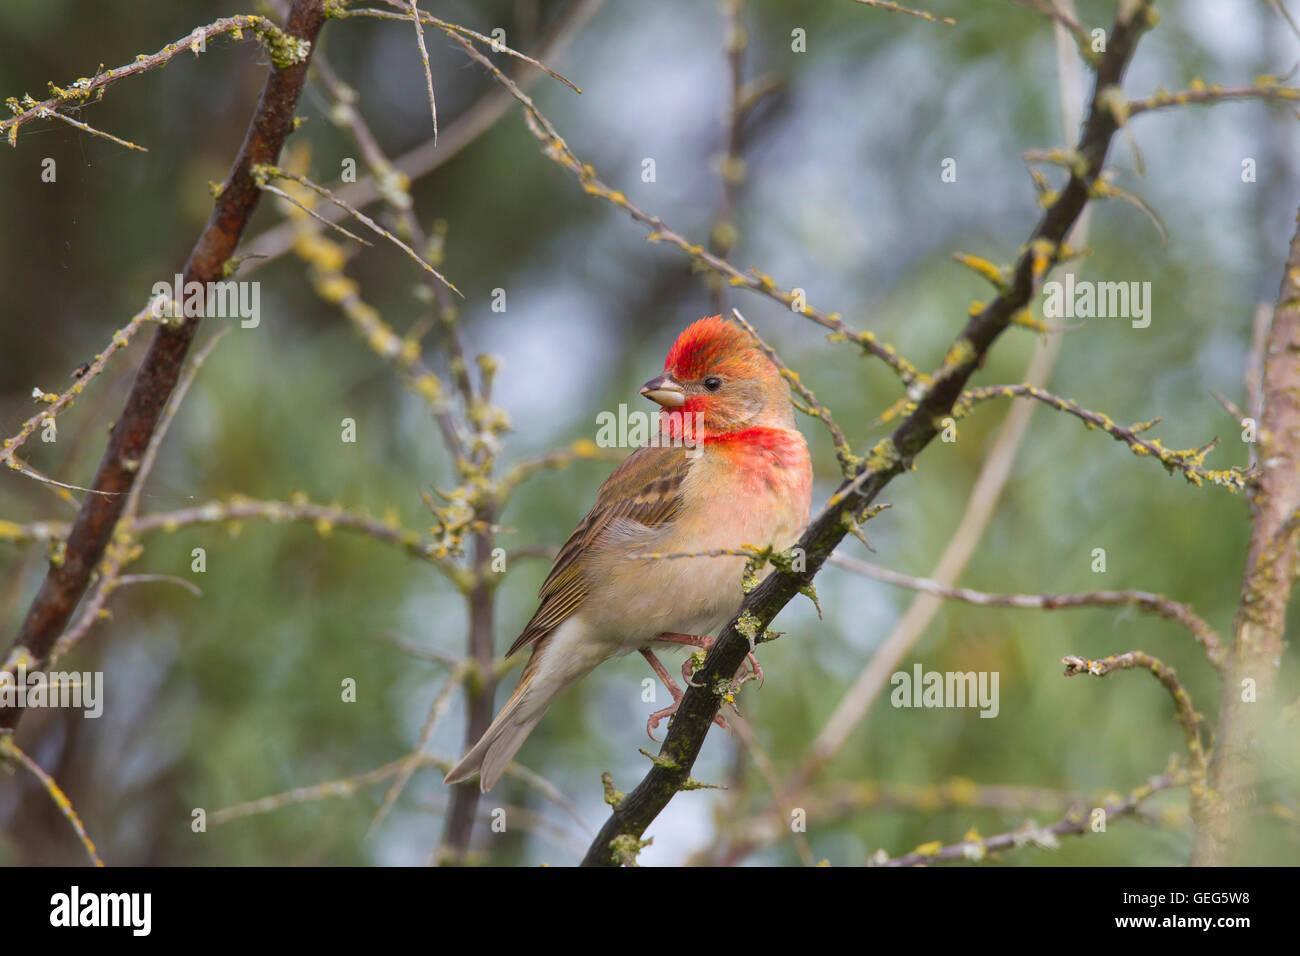 common-rosefinch-scarlet-rosefinch-carpo